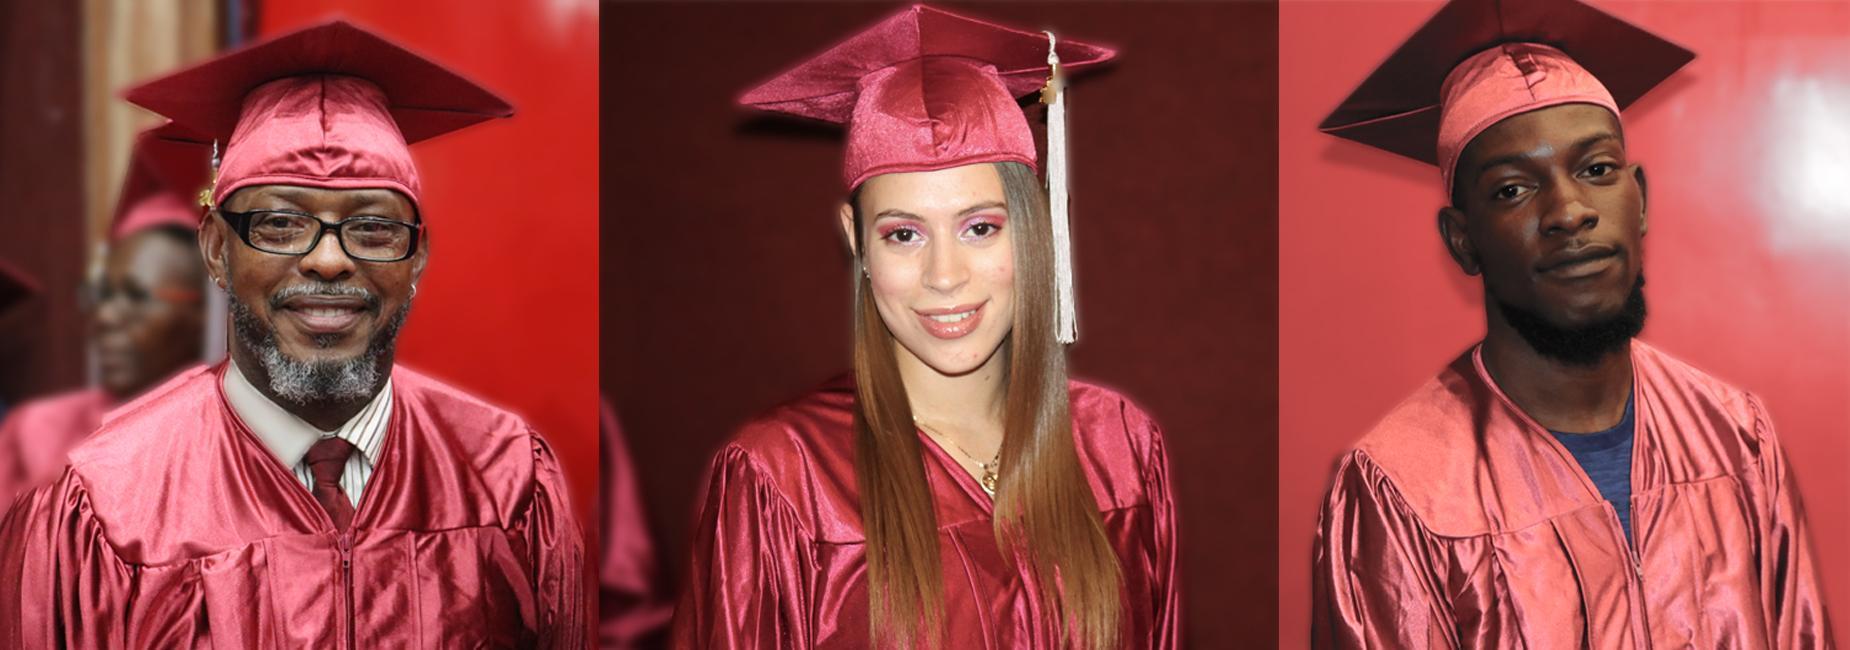 shuffle 1 - Graduation Pictures